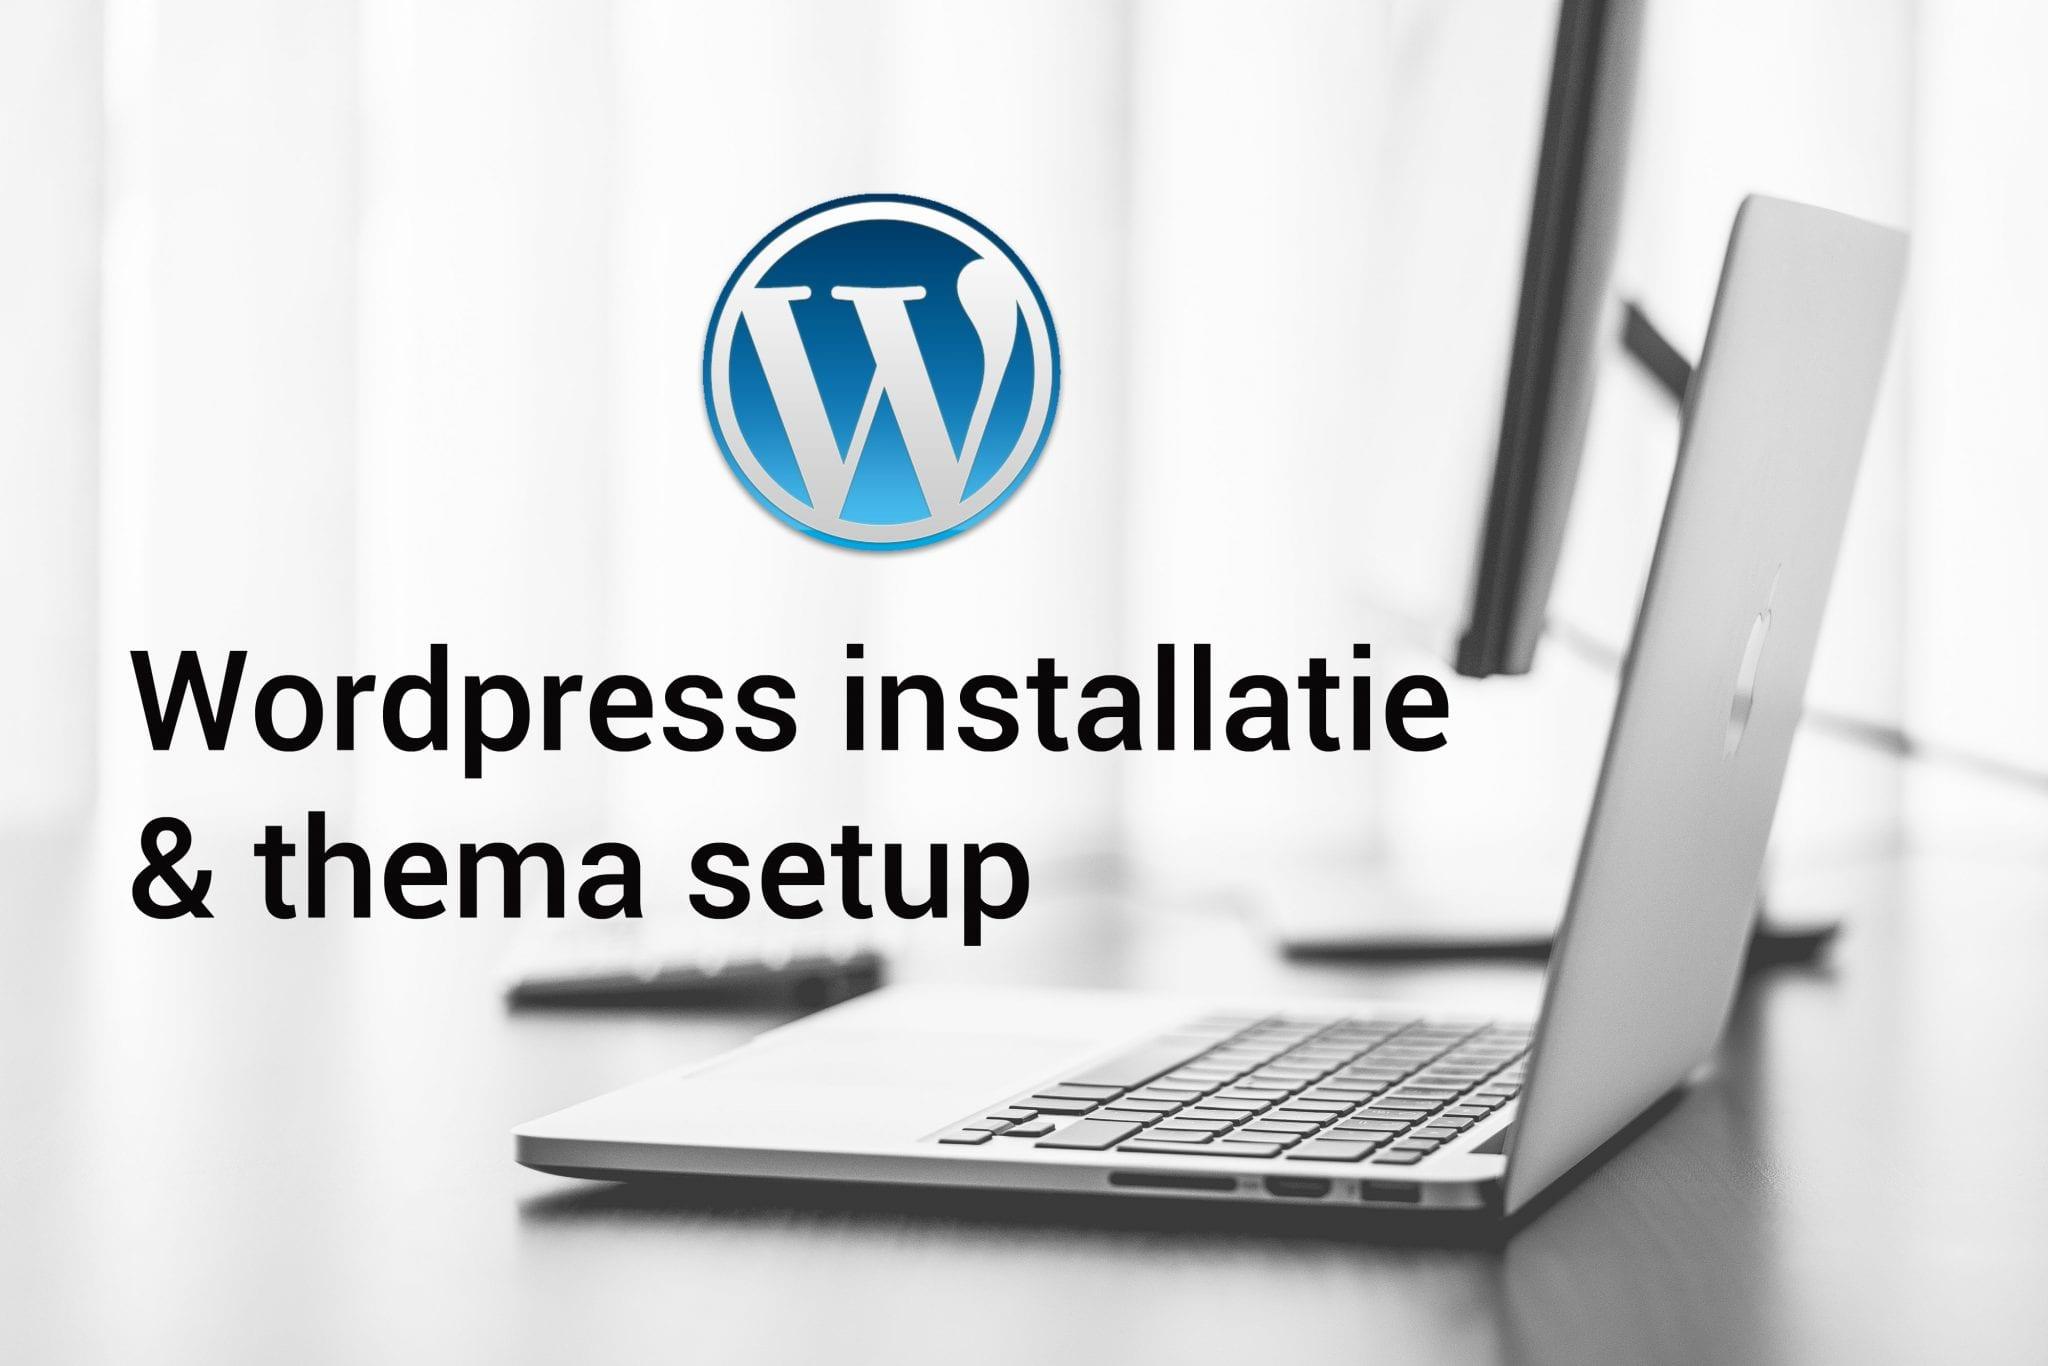 WordPress installatie en thema setup